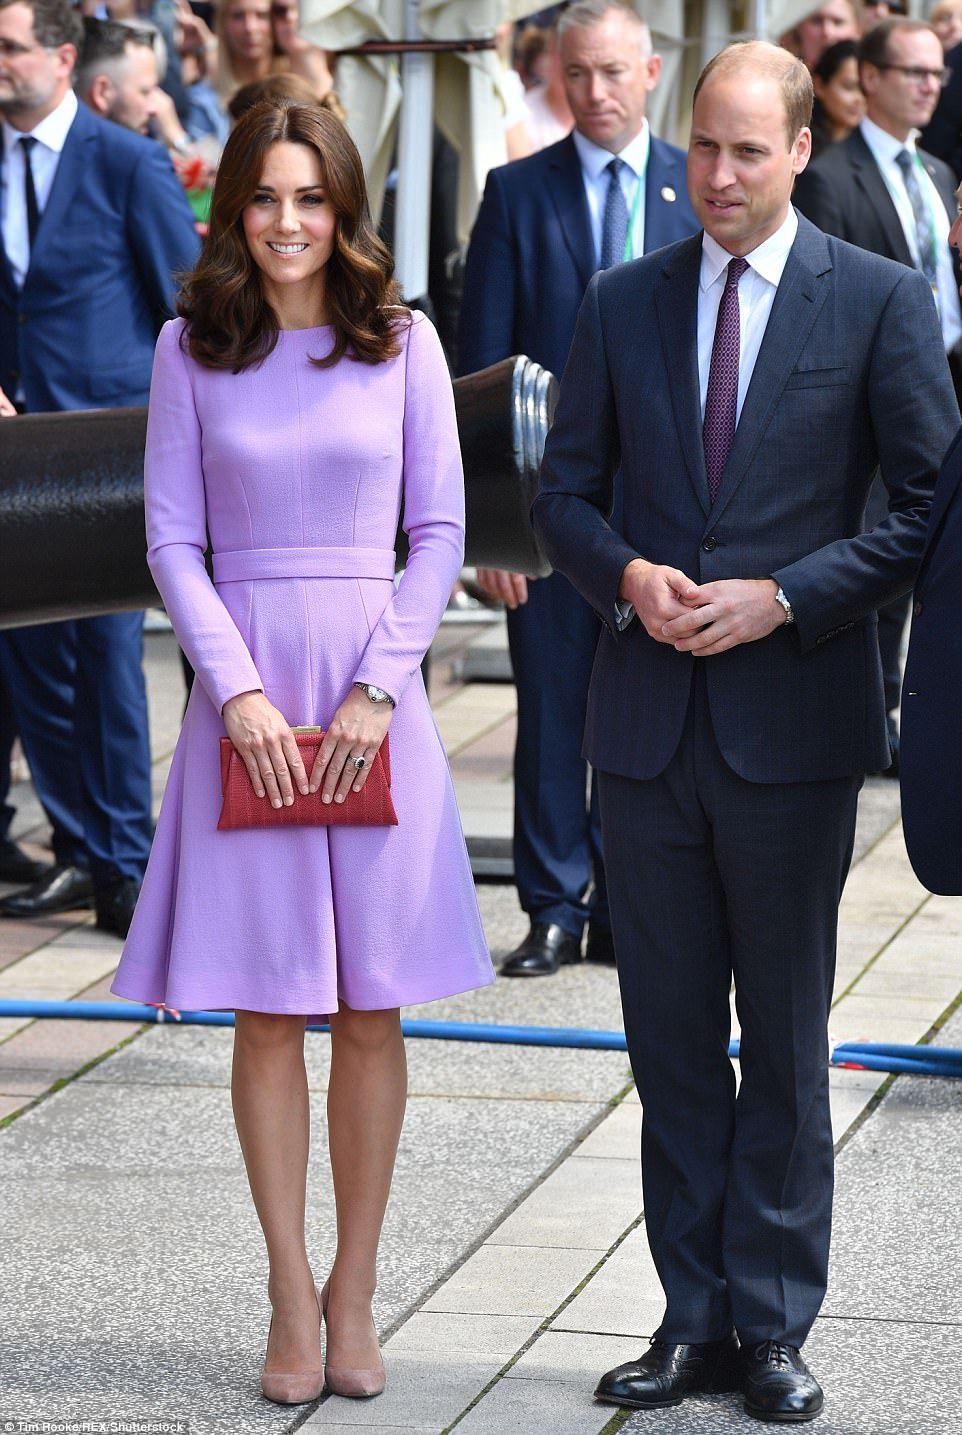 Statement Clutch - Duke and Duchess by VIDA VIDA SX4DFF0r